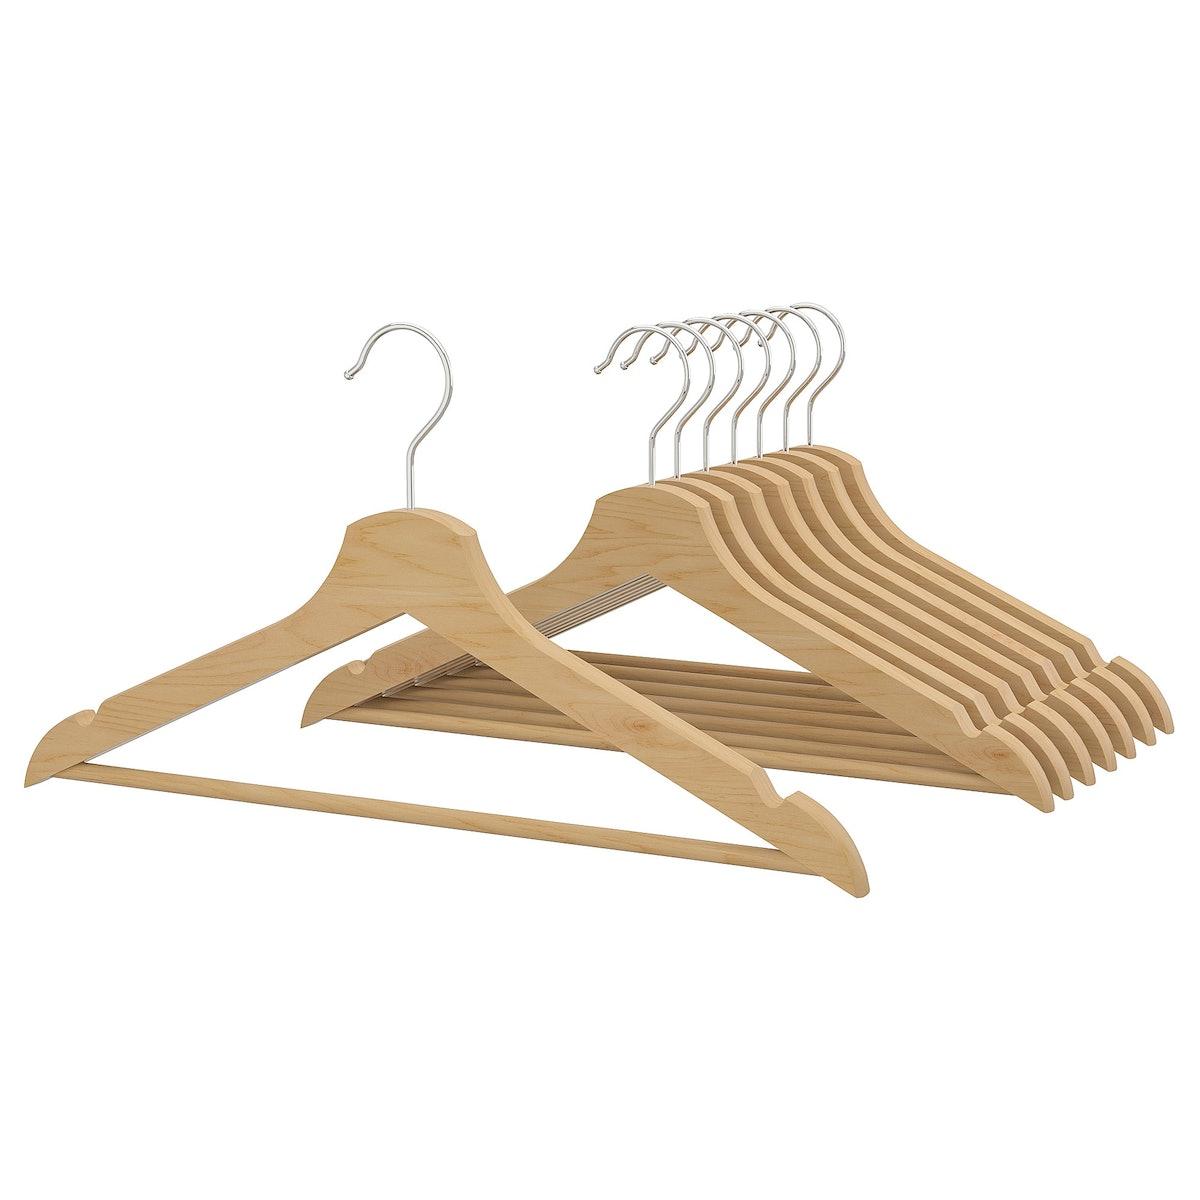 BUMERANG Hanger, Natural, 8-pack